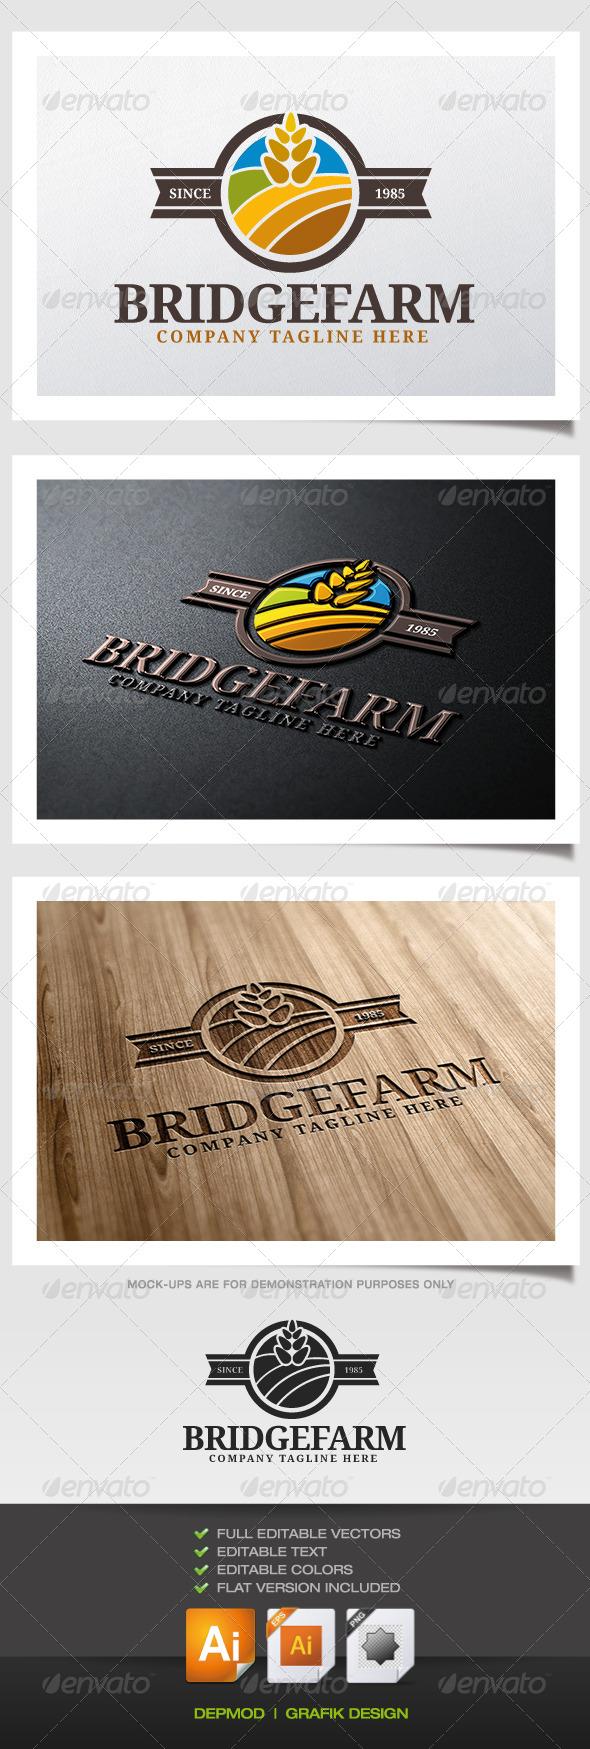 GraphicRiver Bridge Farm Logo 5390143